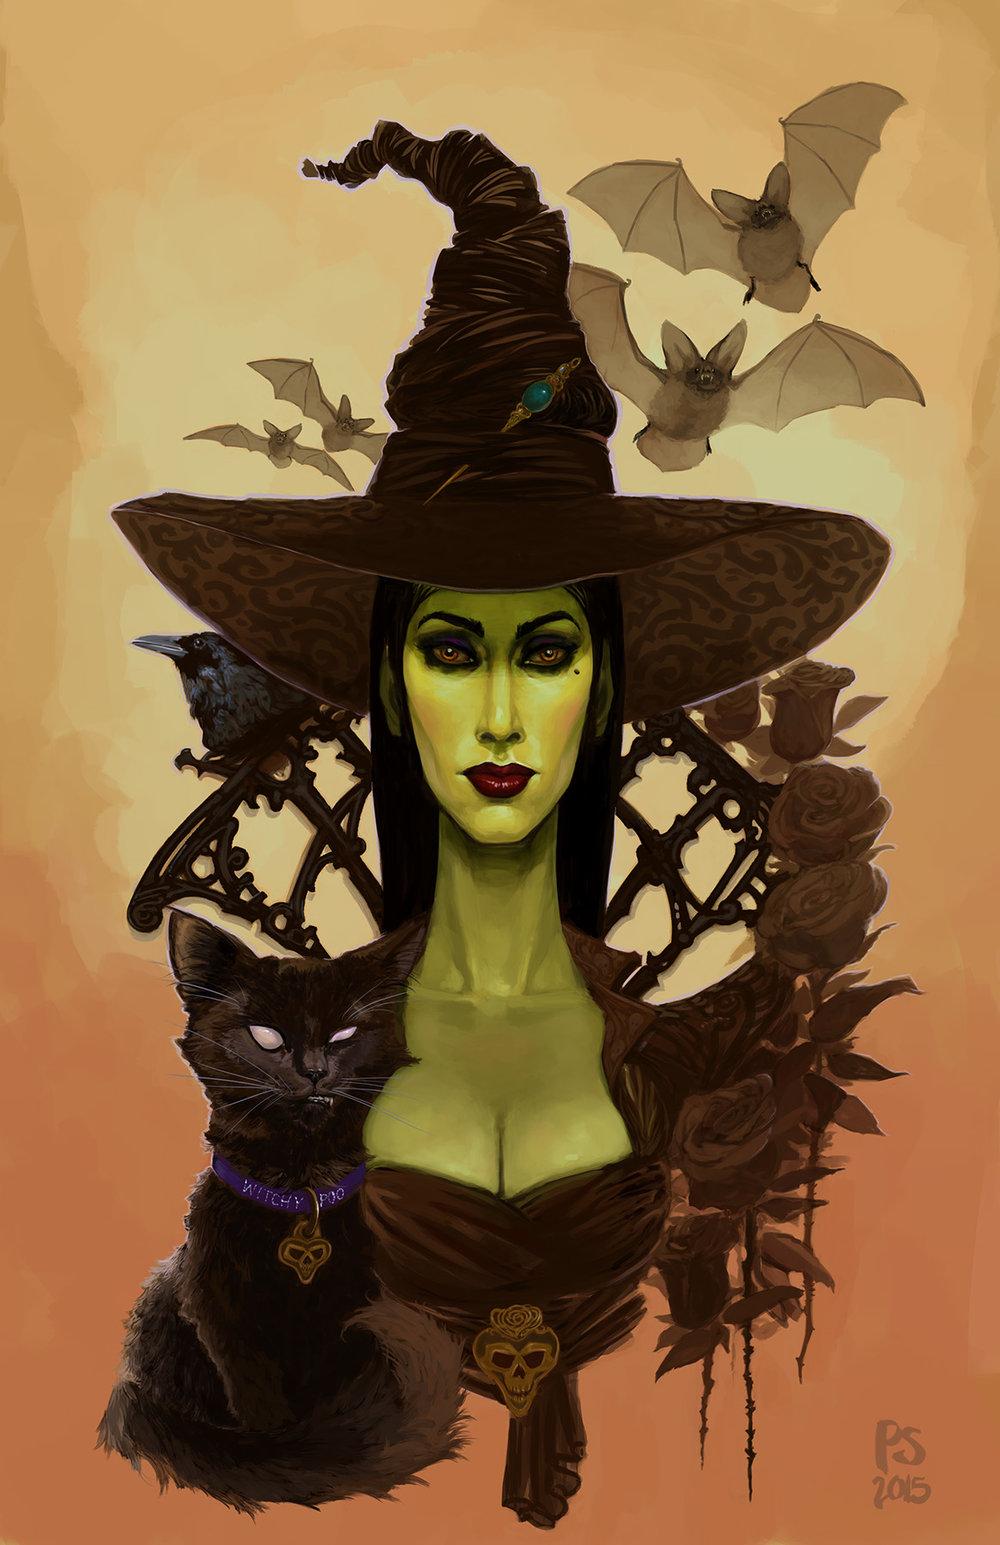 WitchyPoo-psmith-Ifx.jpg